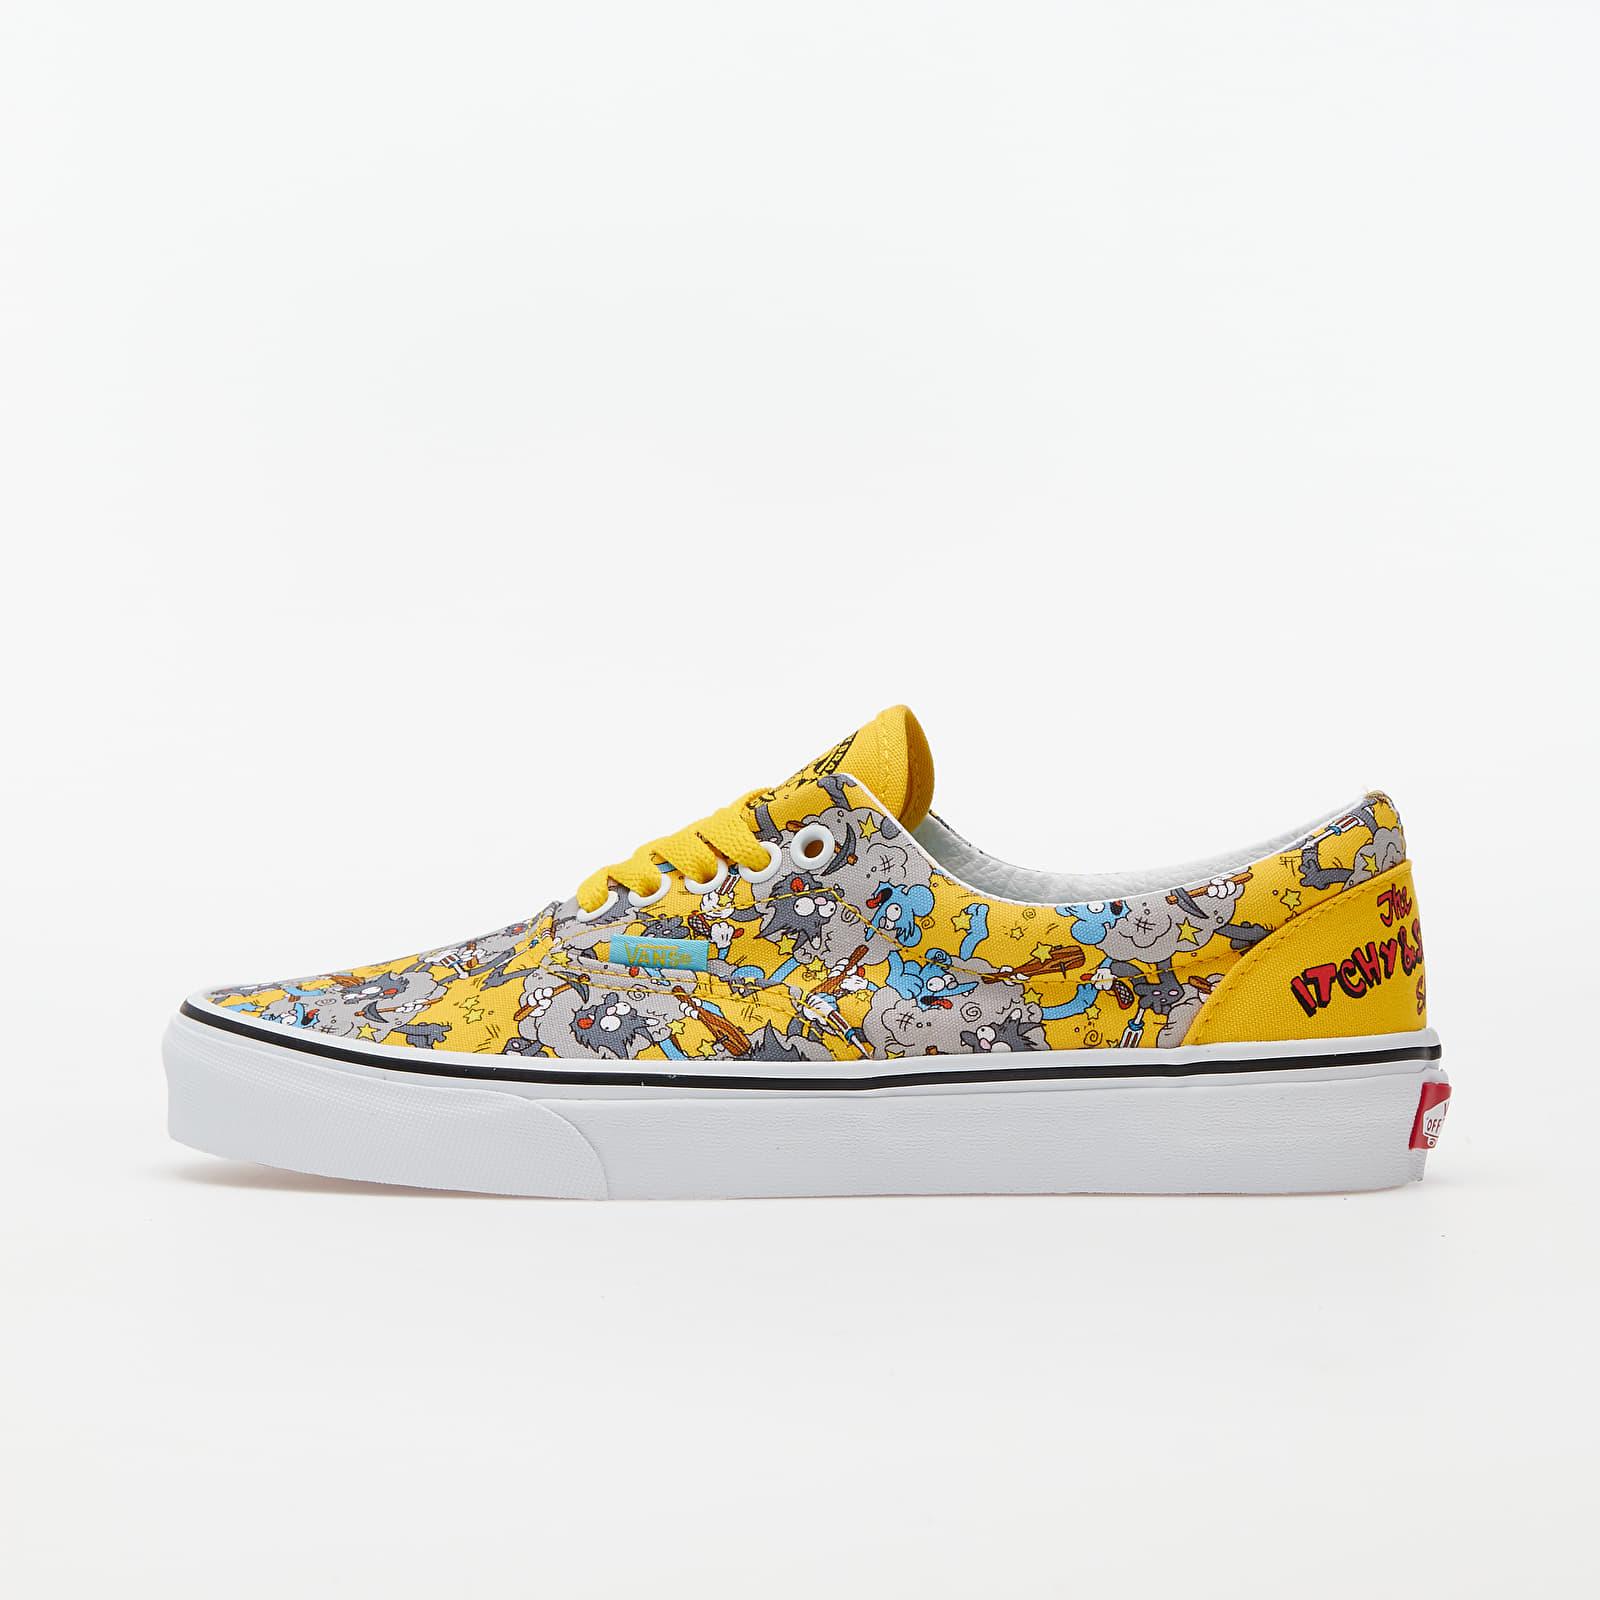 Men's shoes Vans Era (The Simpsons) Itchy & Scratchy